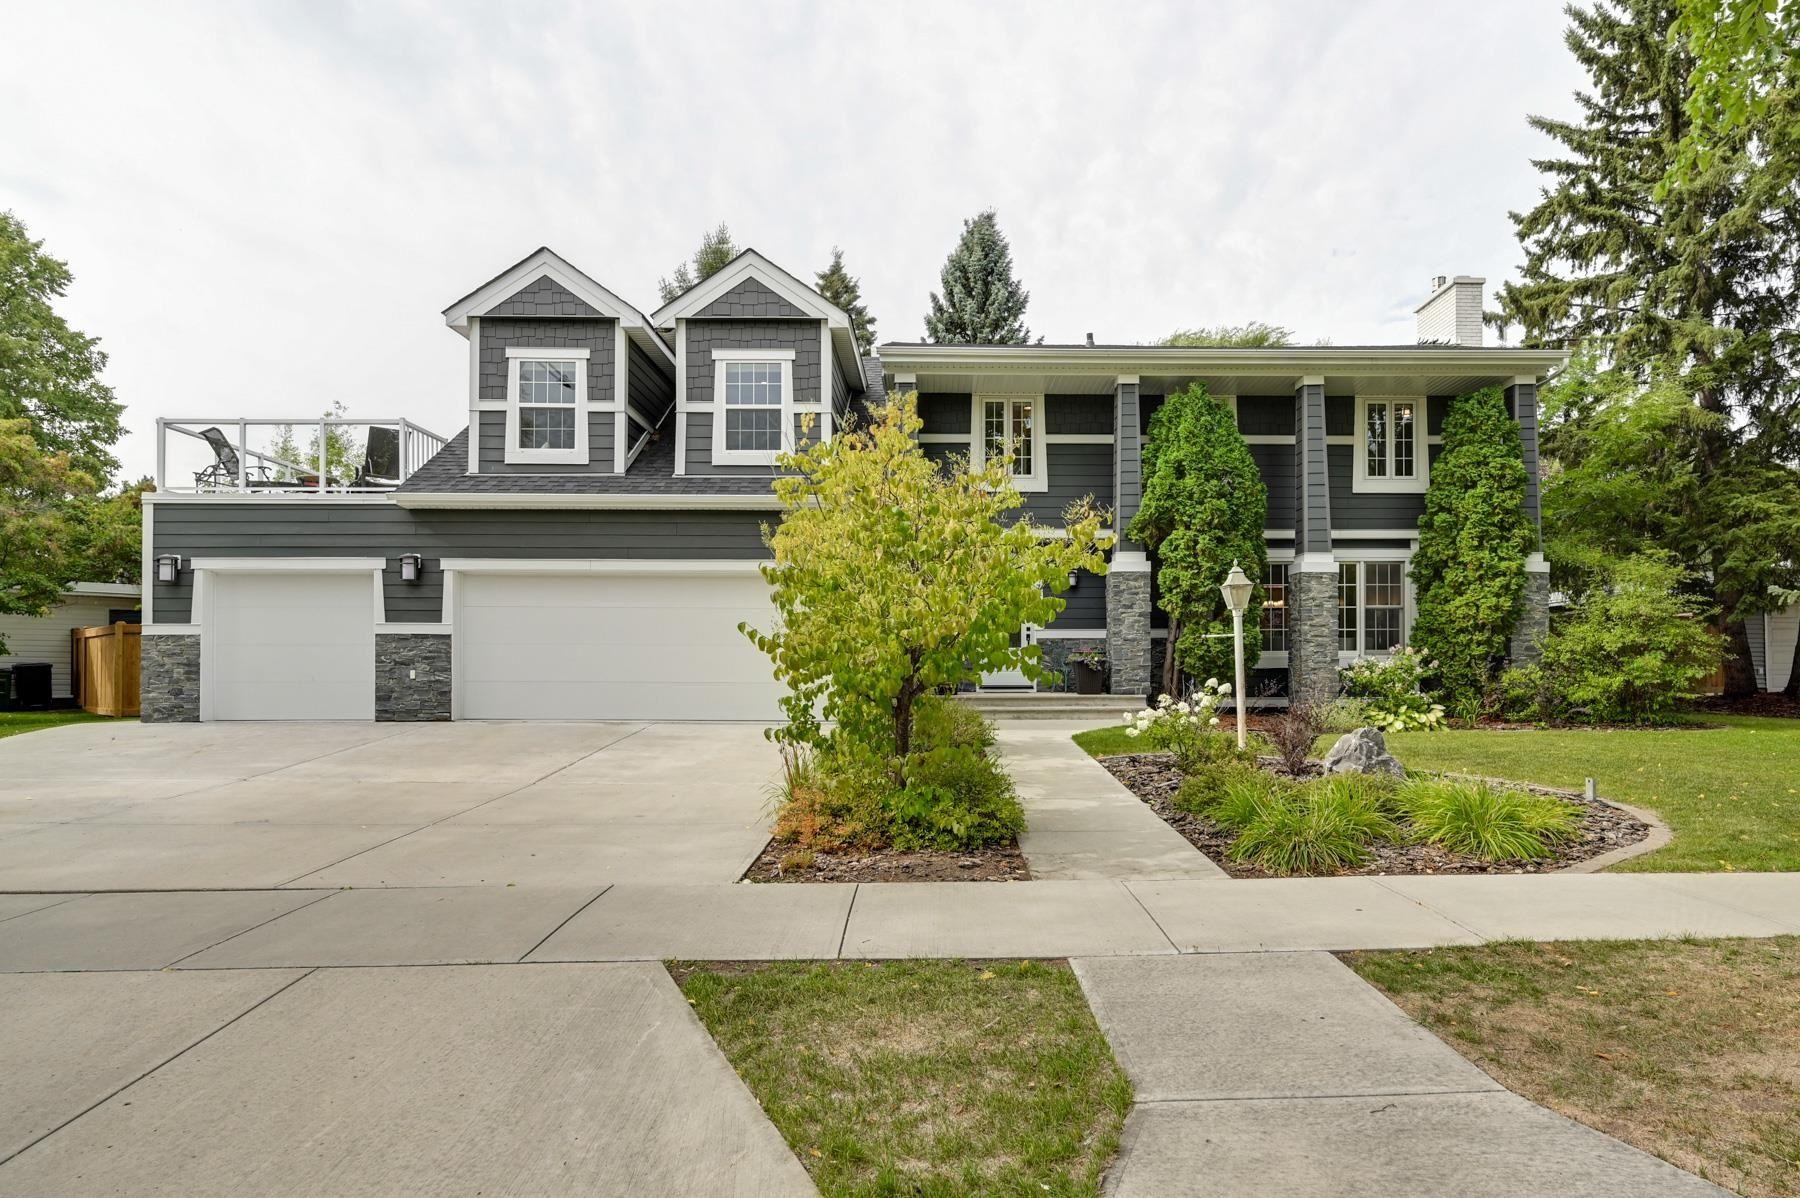 Main Photo: 7302 149 Street in Edmonton: Zone 22 House for sale : MLS®# E4262093